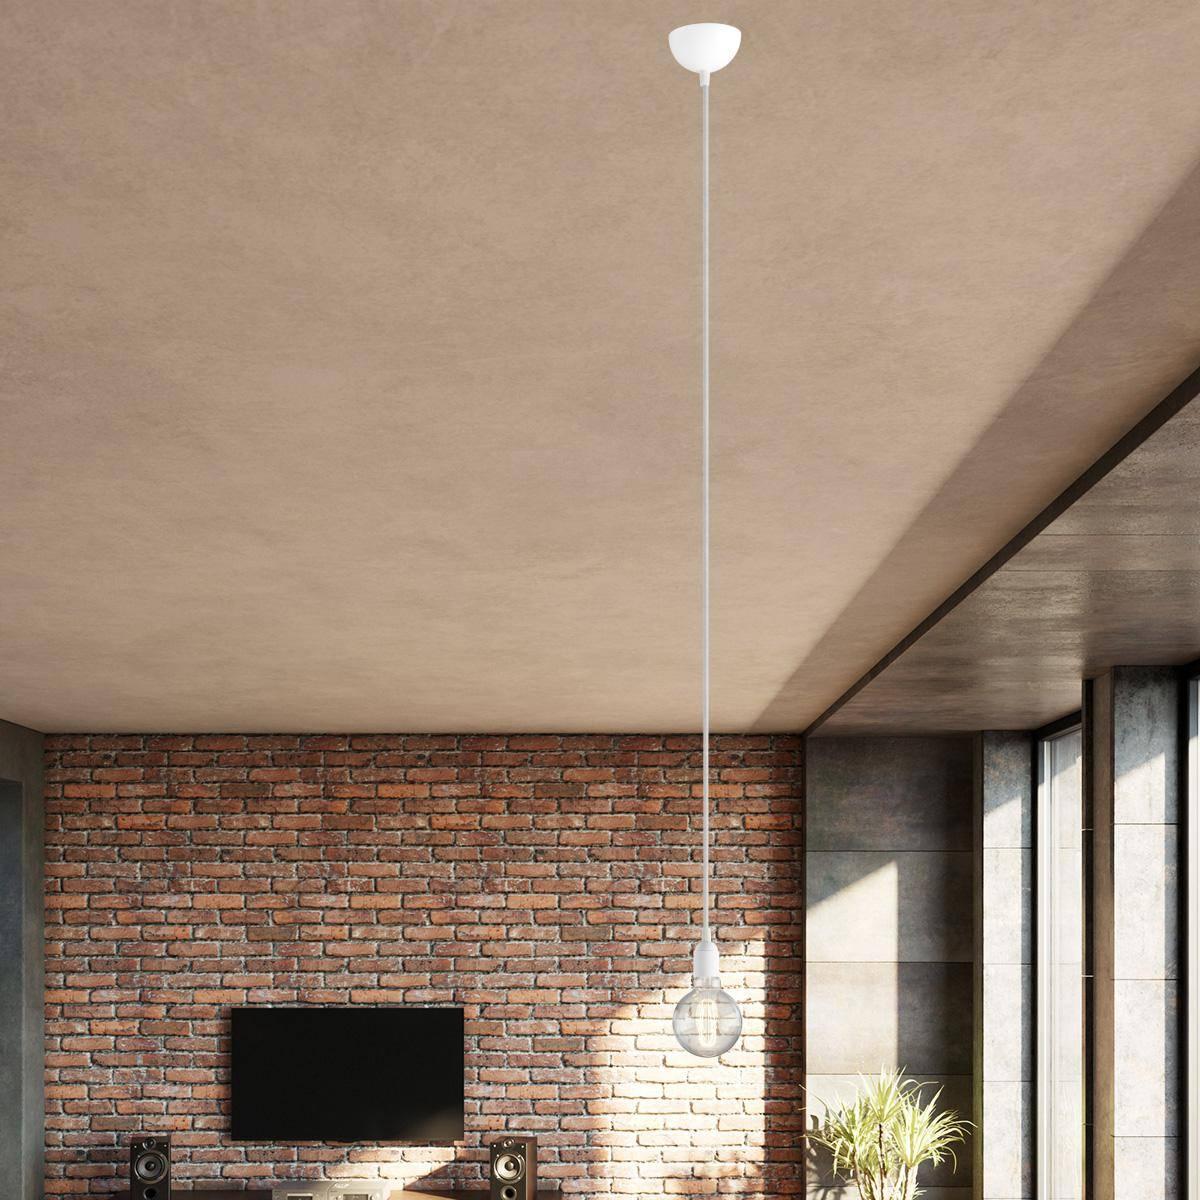 Single Pendant Lighting with naked bulb